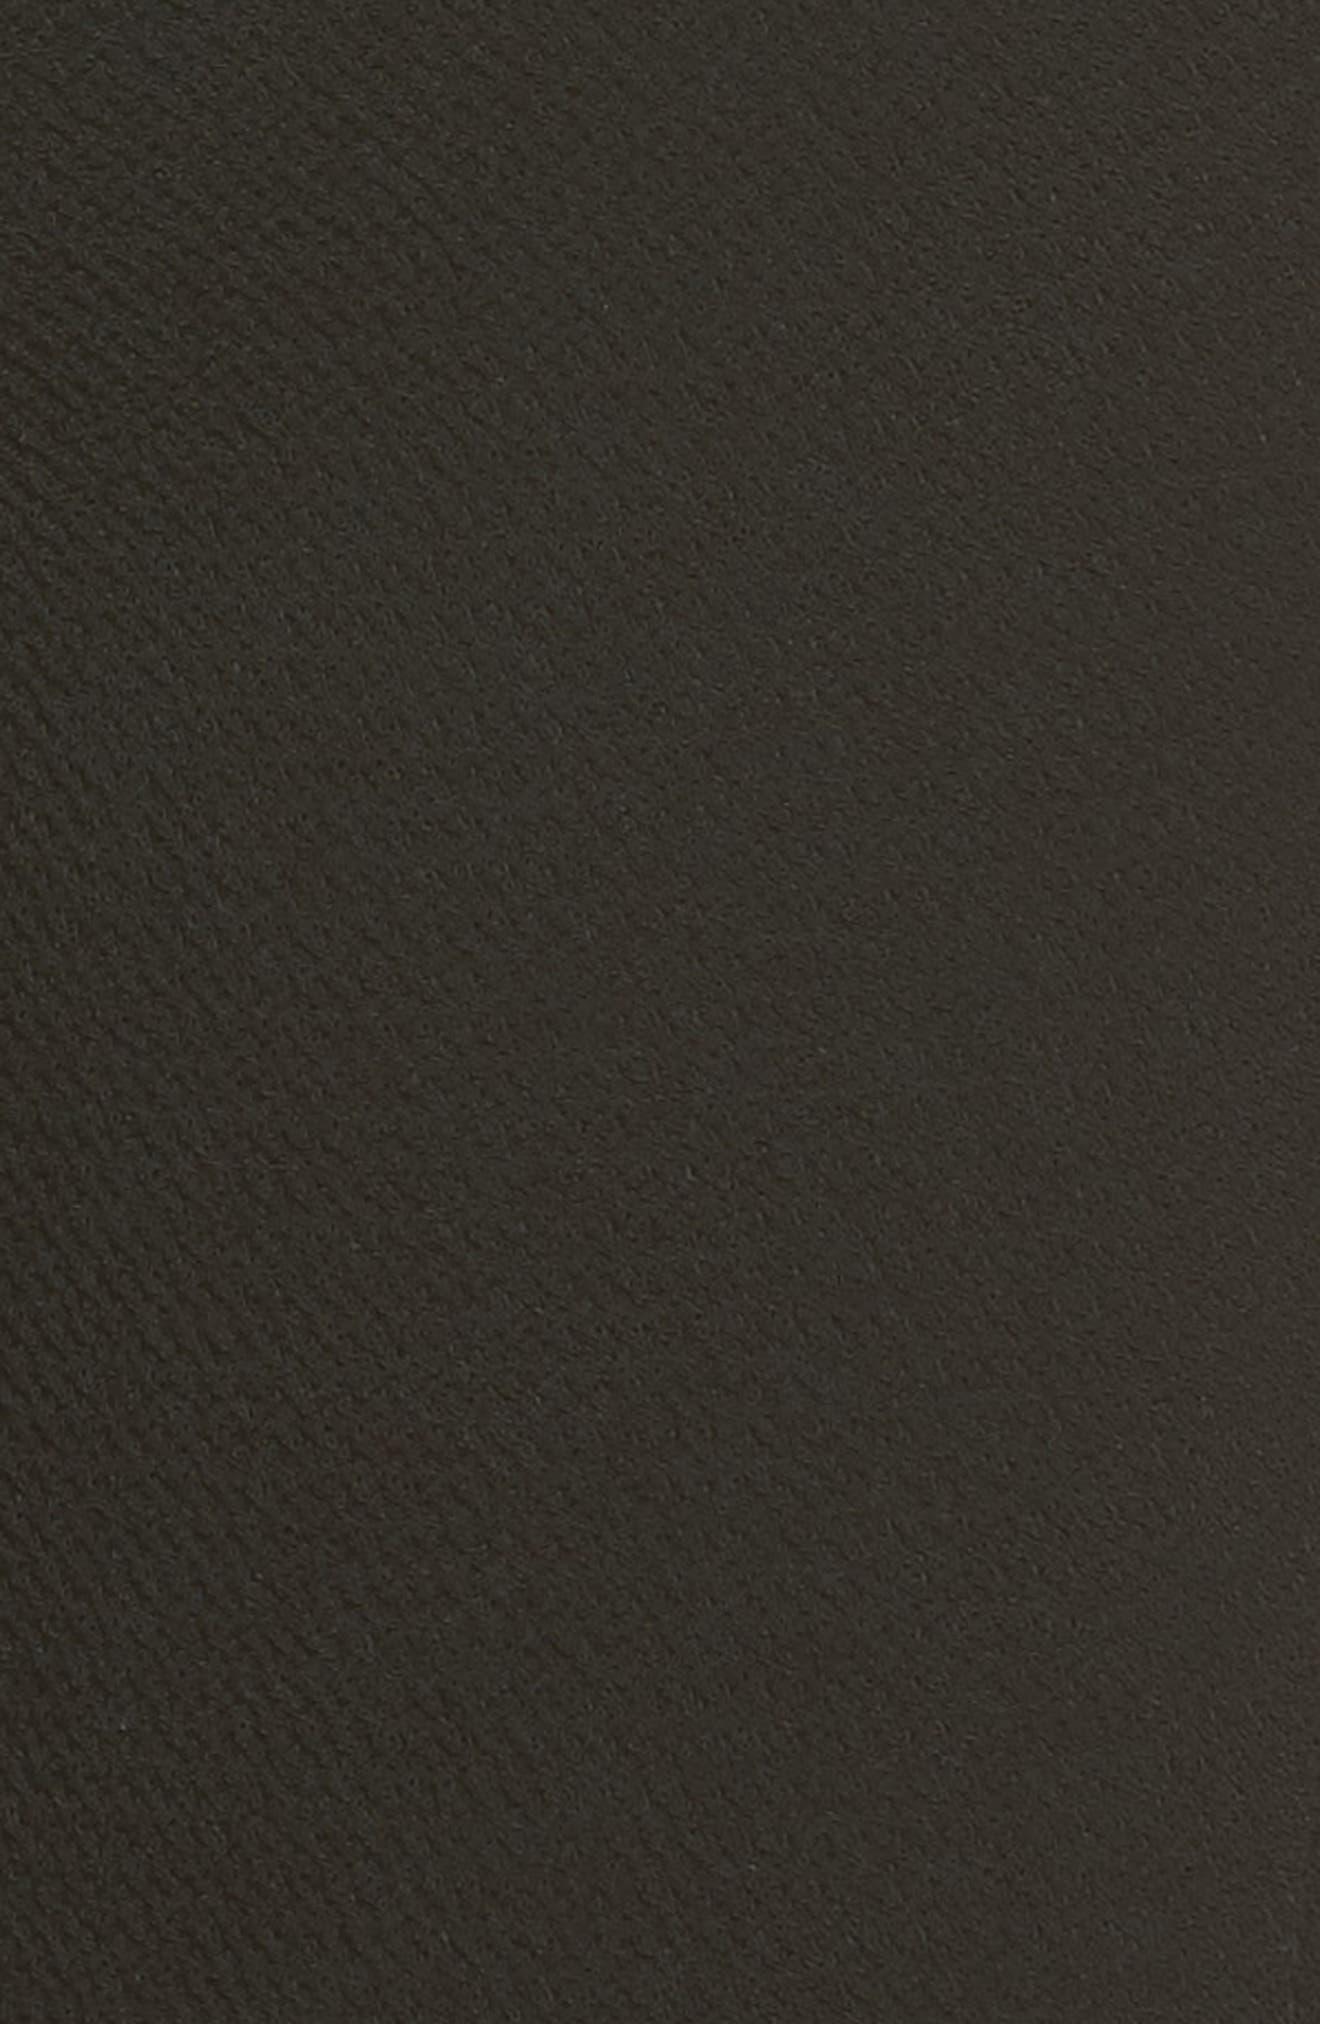 Atestelito Slim Crepe Suit Pants,                             Alternate thumbnail 5, color,                             001